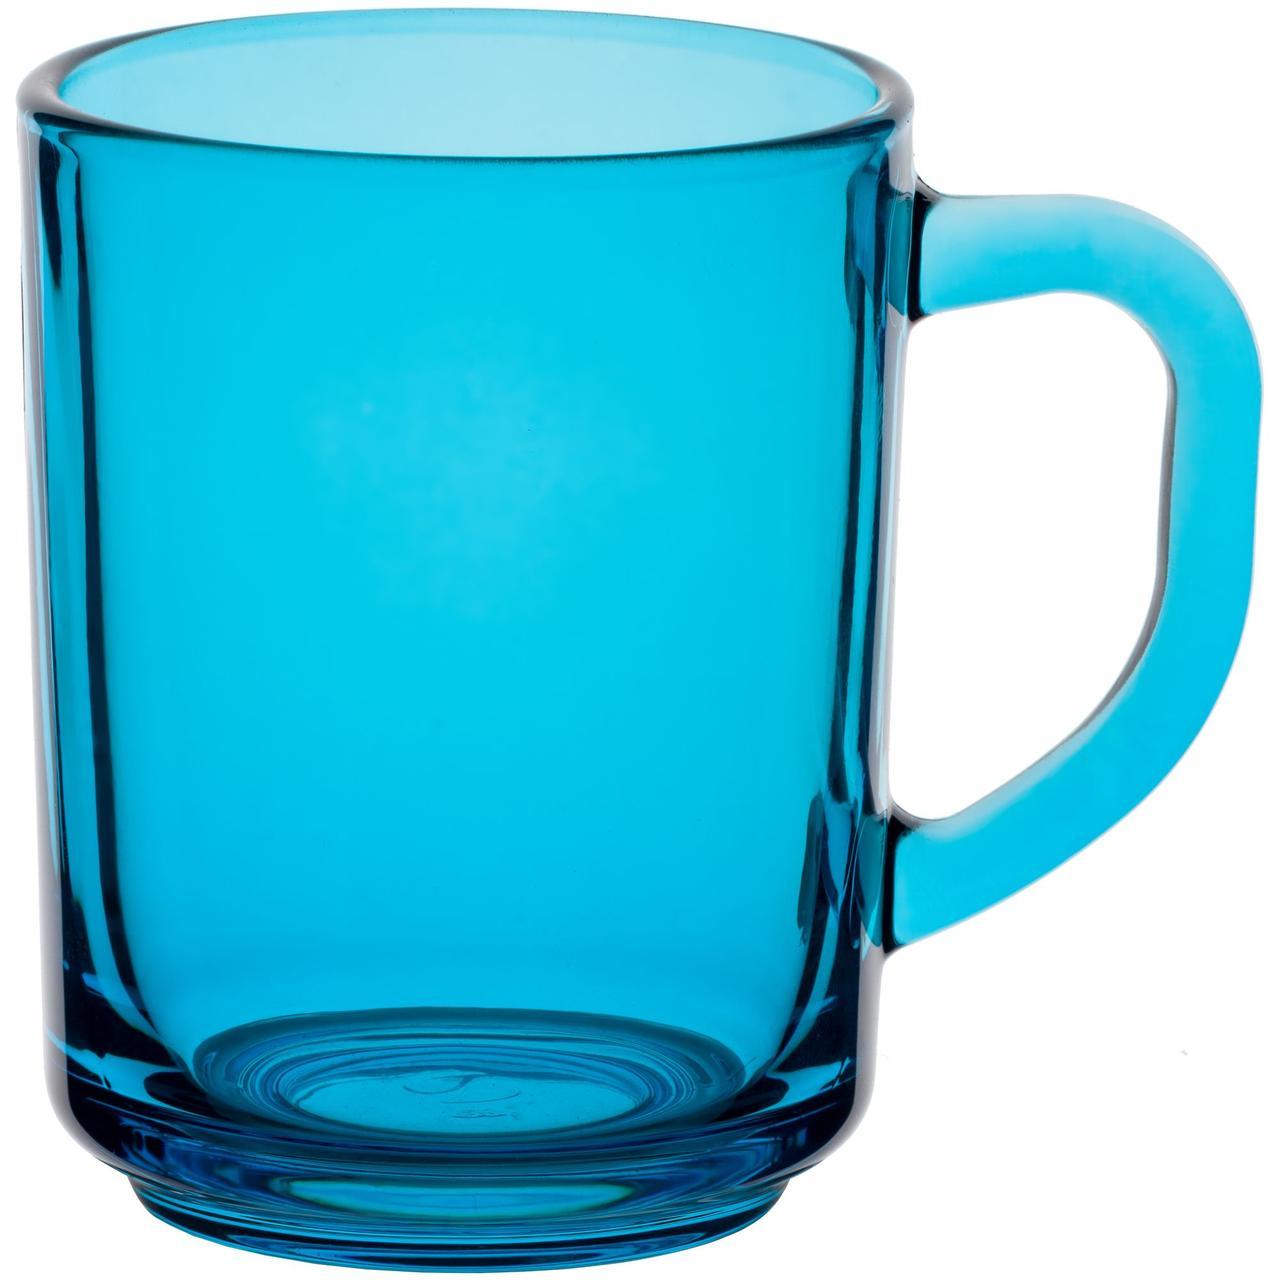 Кружка Enjoy, голубая (артикул 10248.40)